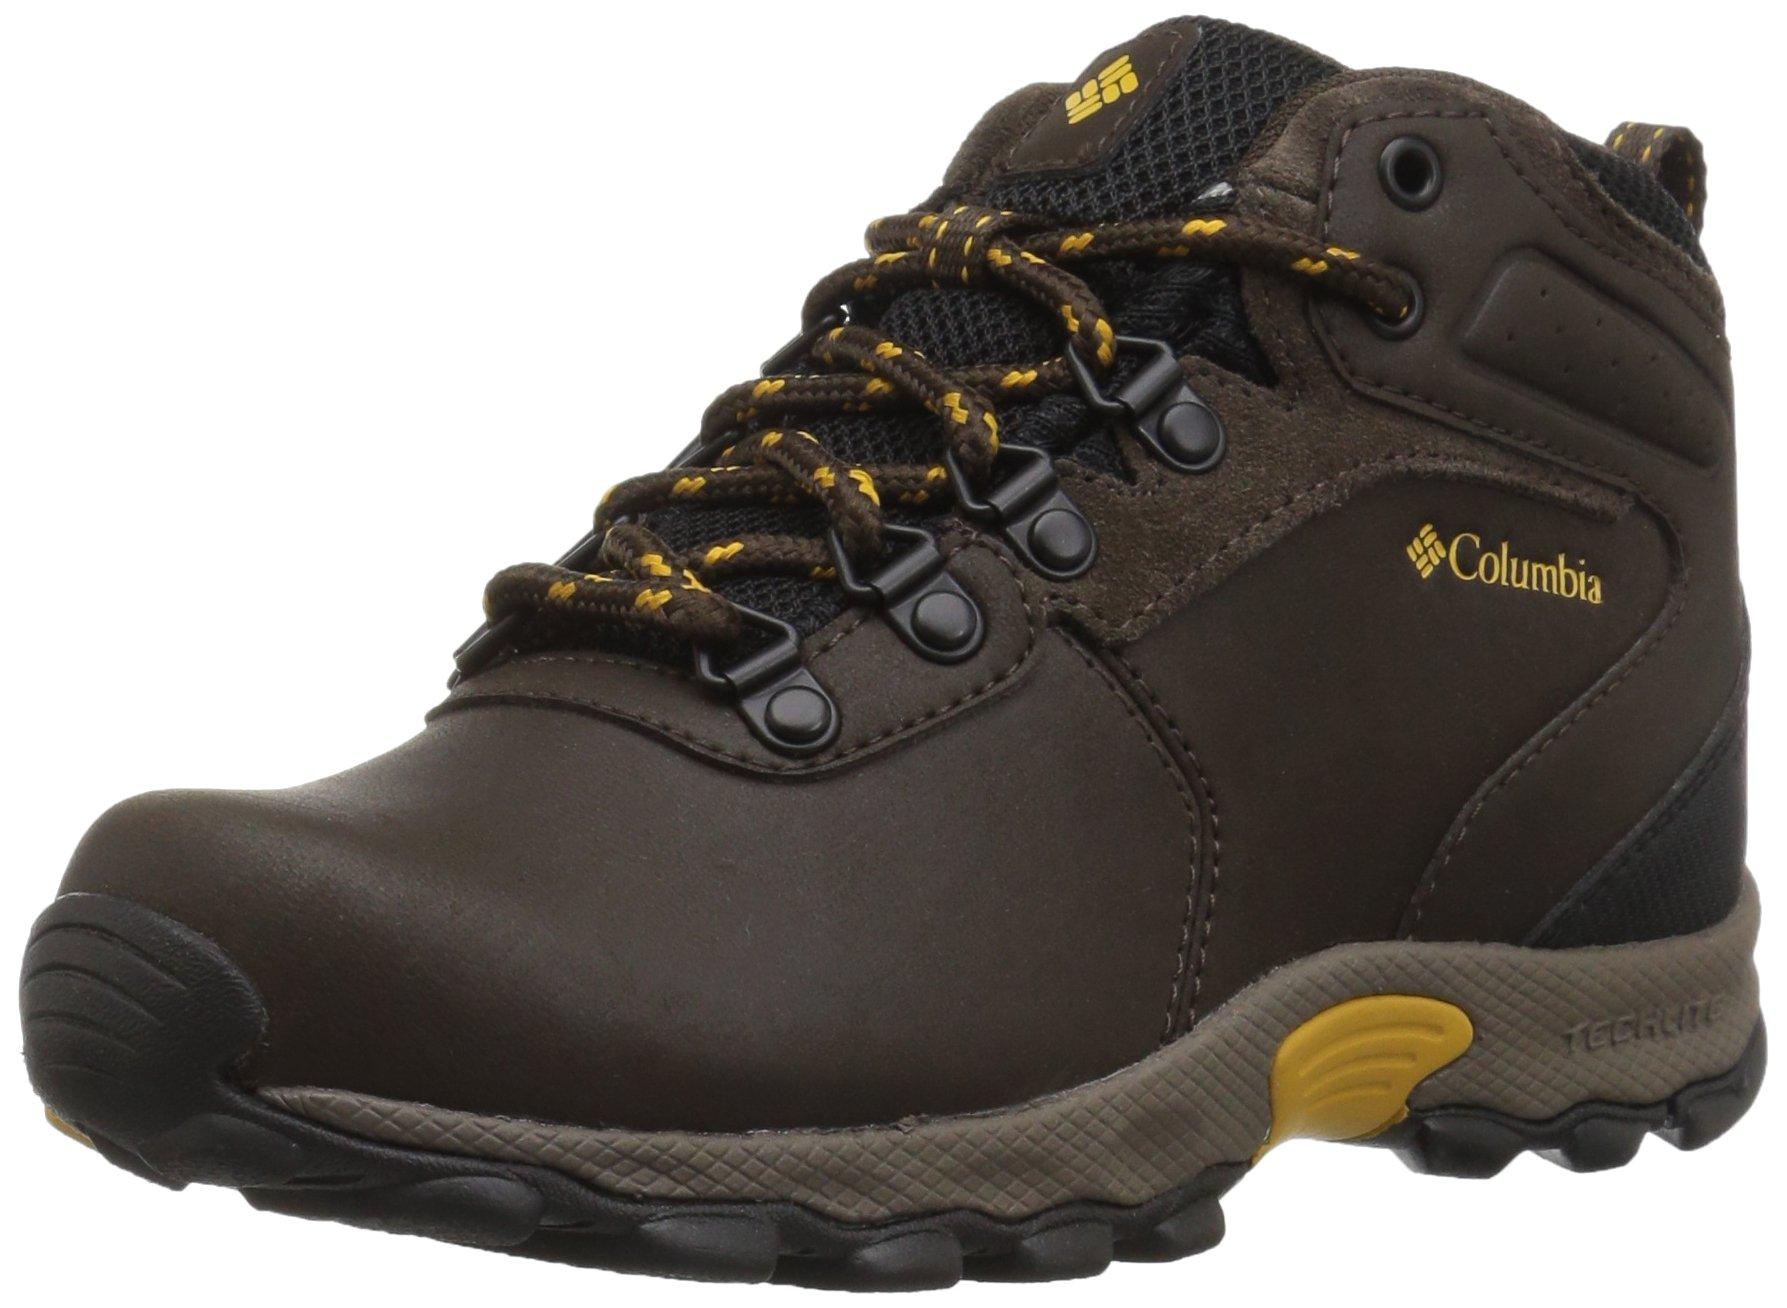 Columbia Boys' Youth Newton Ridge Hiking Shoe, Cordovan, Golden Yellow, 7 Wide US Big Kid